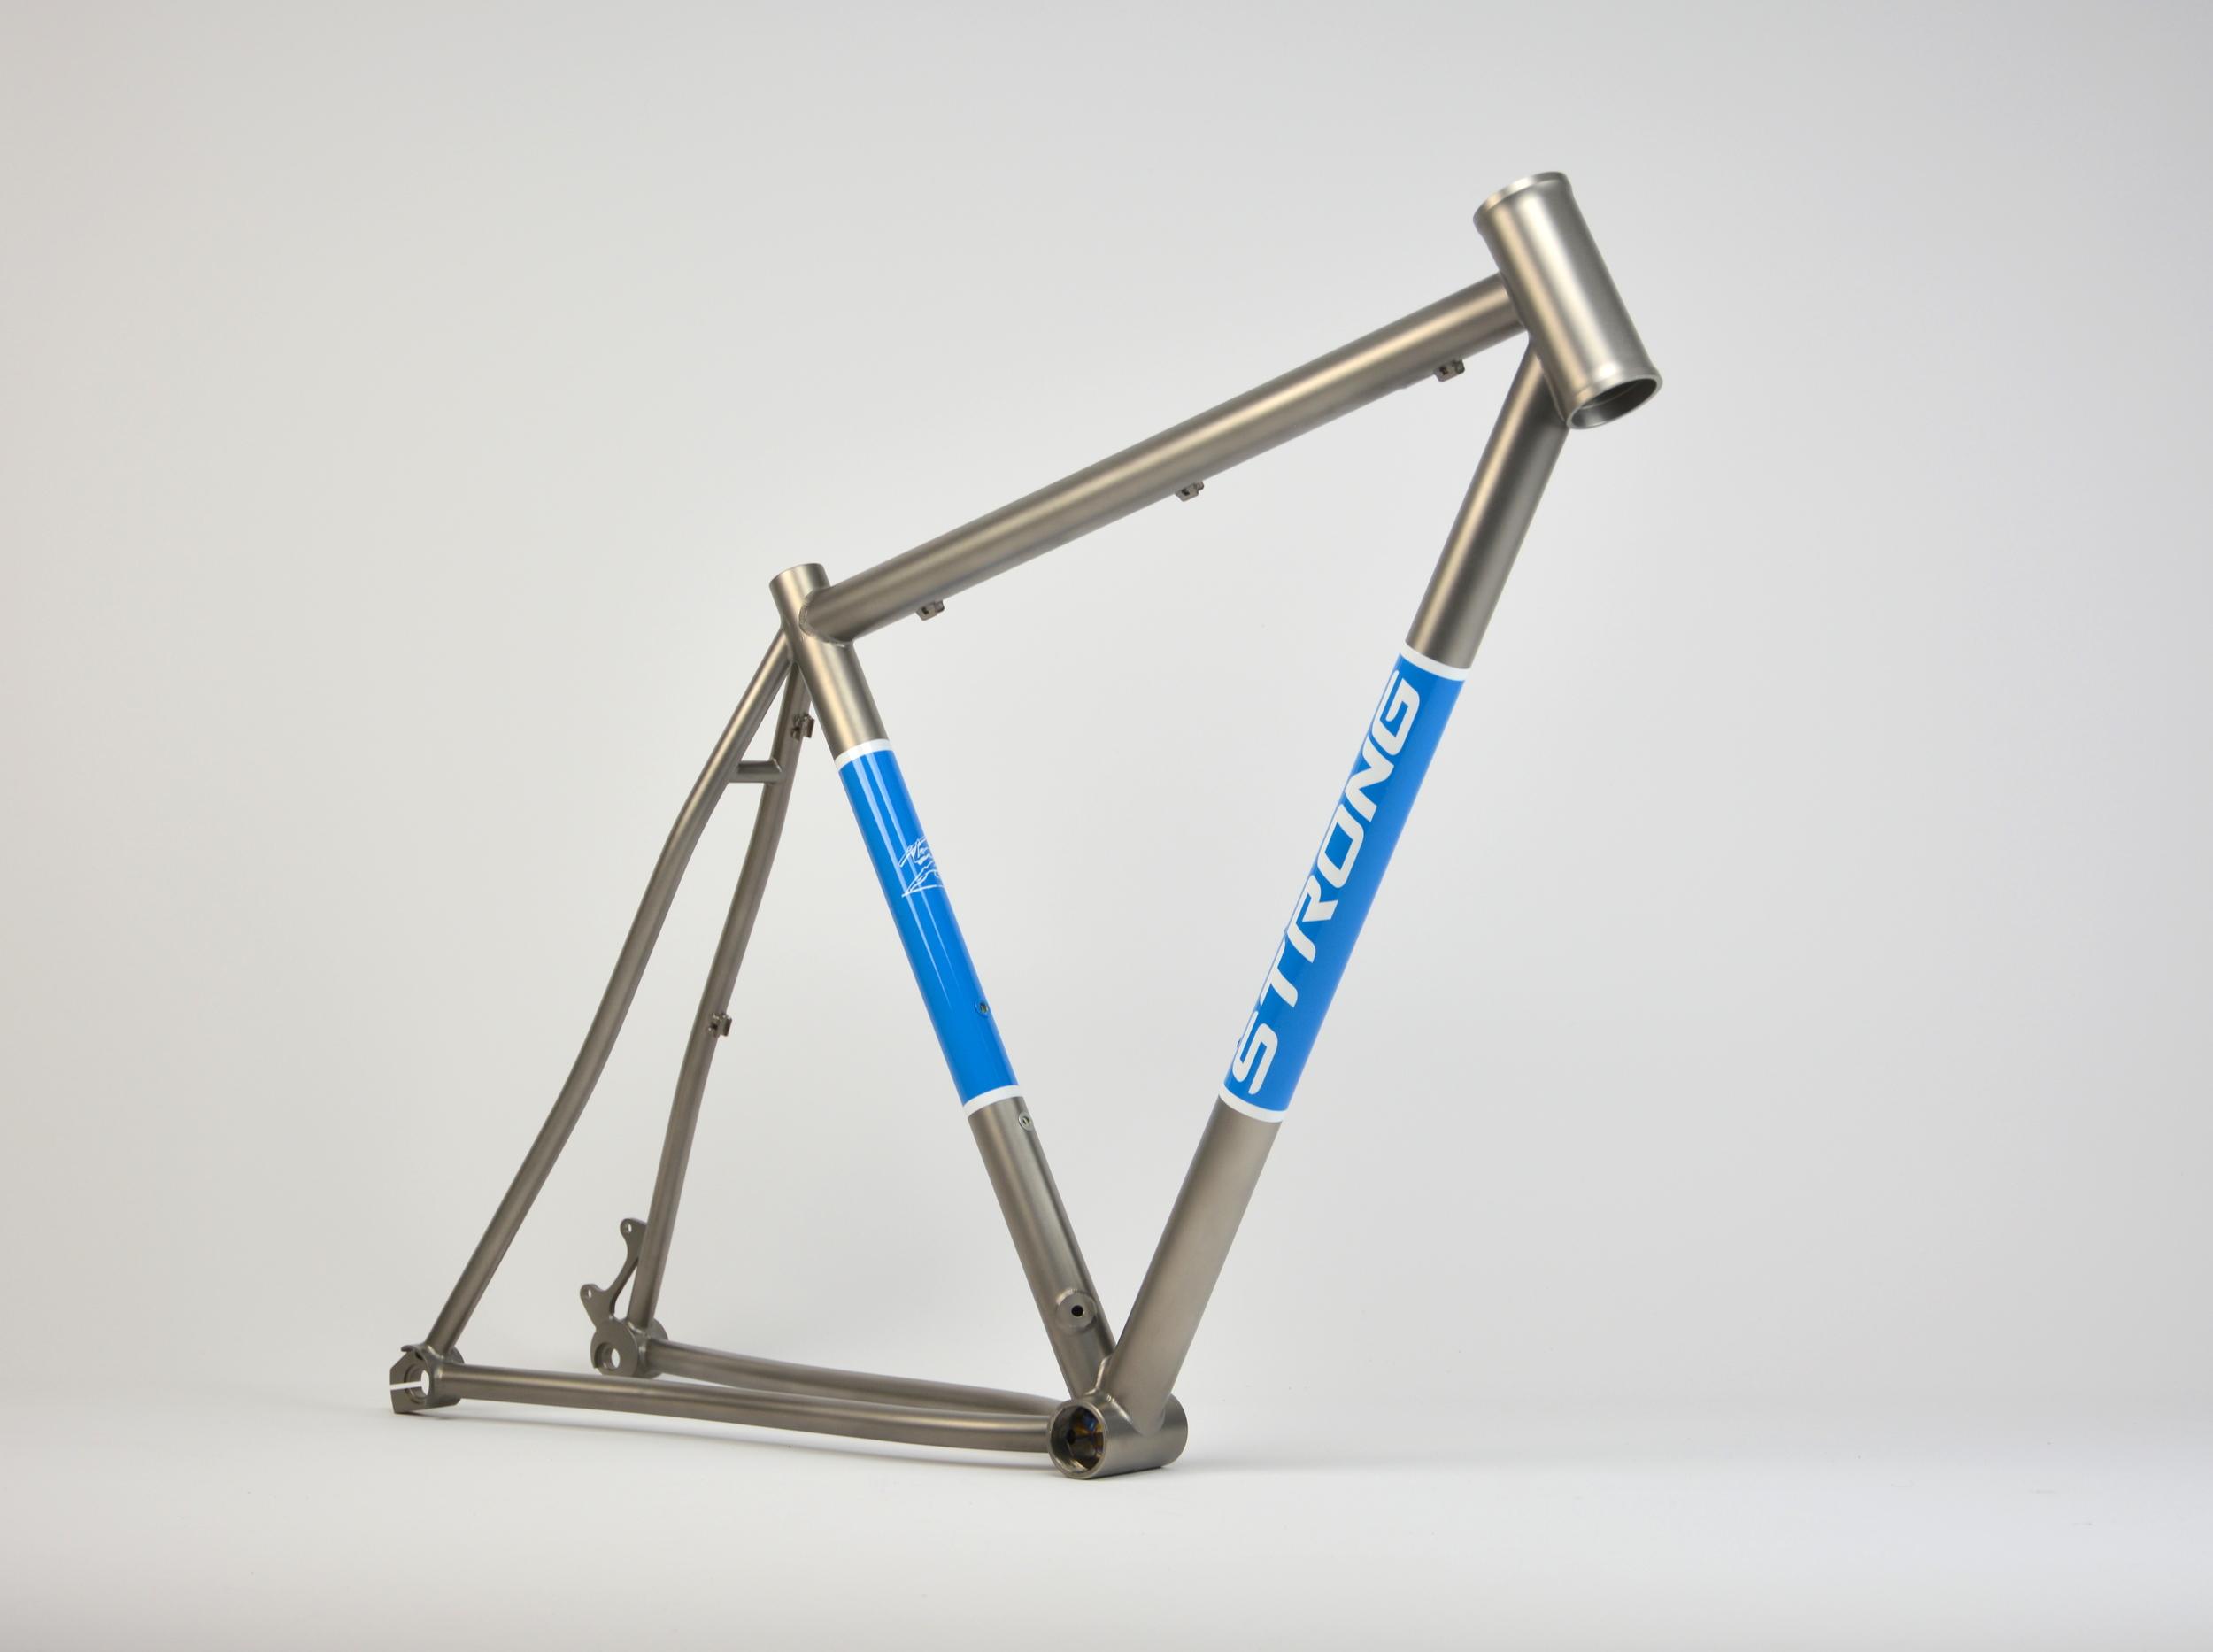 Strong Frames Titanium Road w/Panels